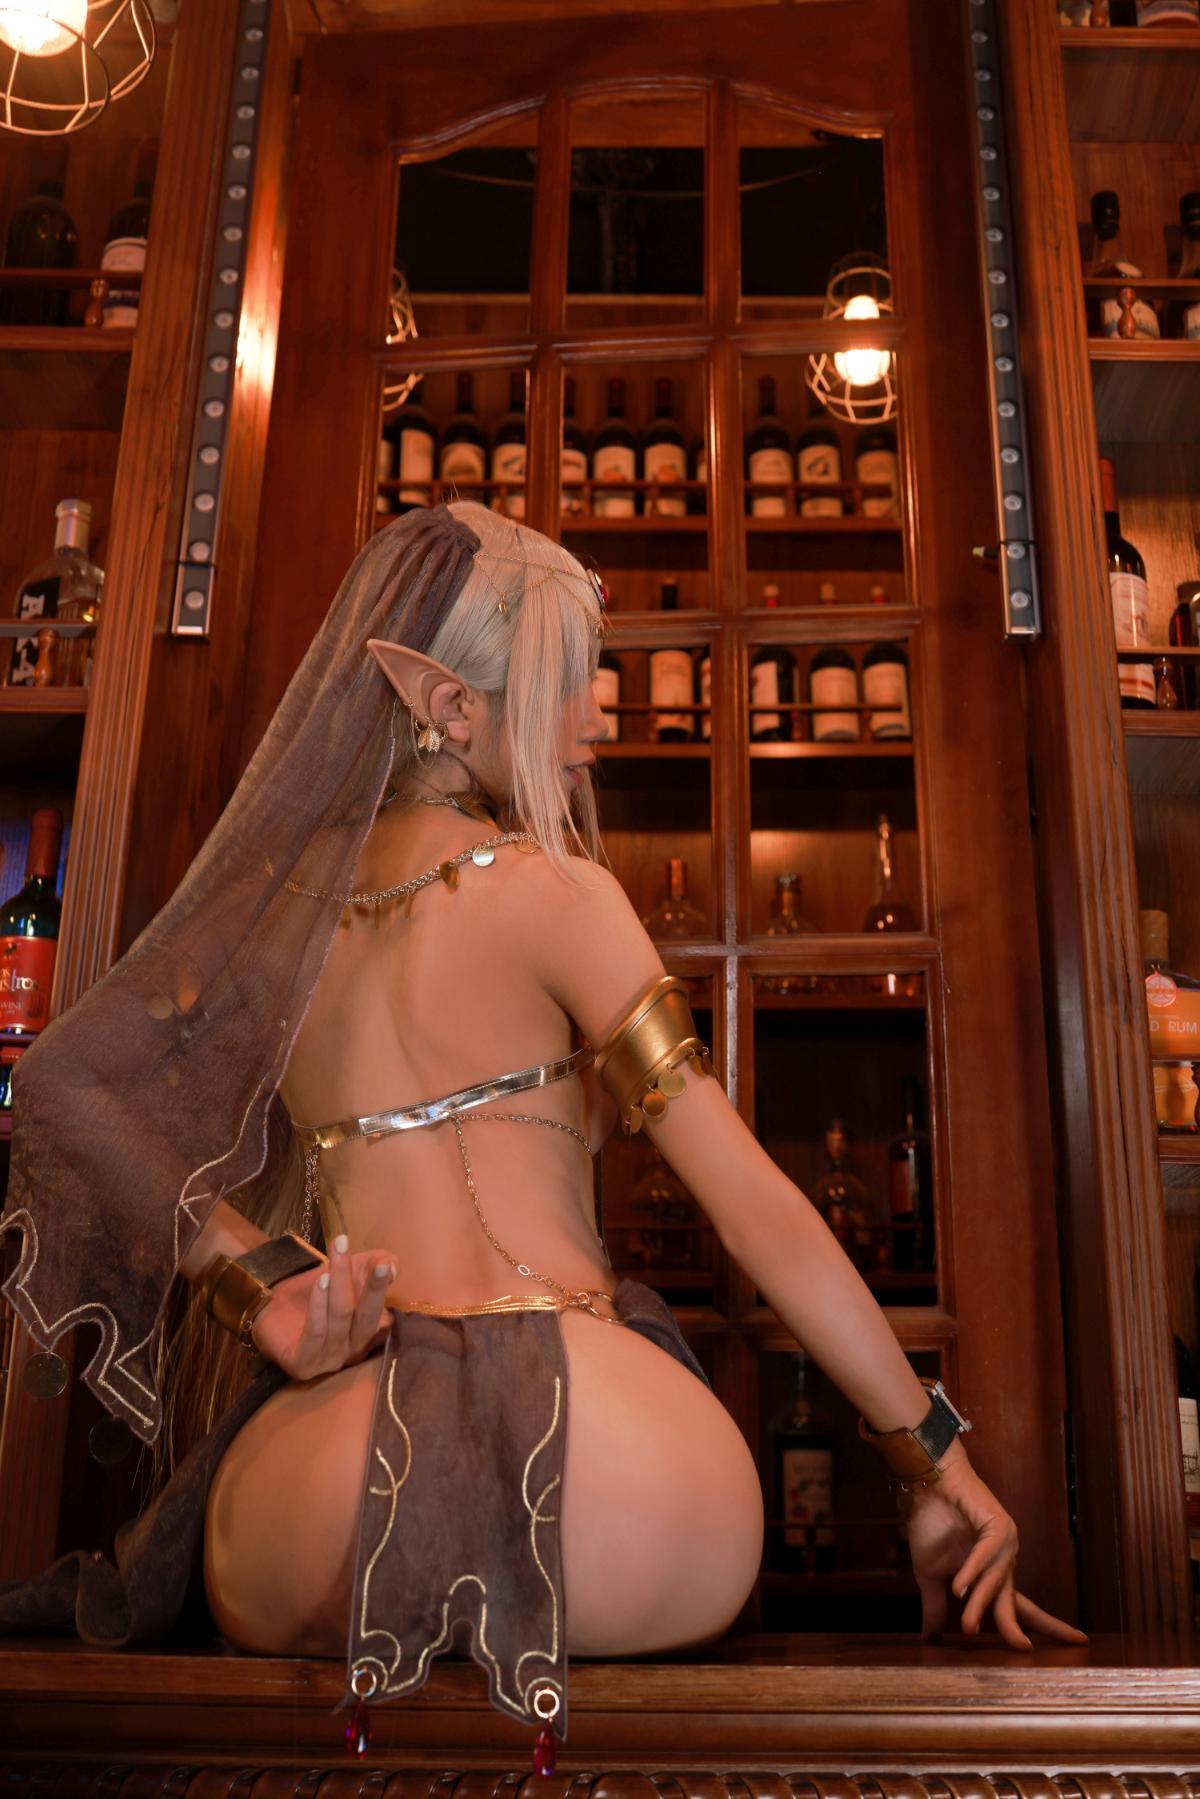 Tan Dancer Elf Succubus Cosplay by Aqua 39